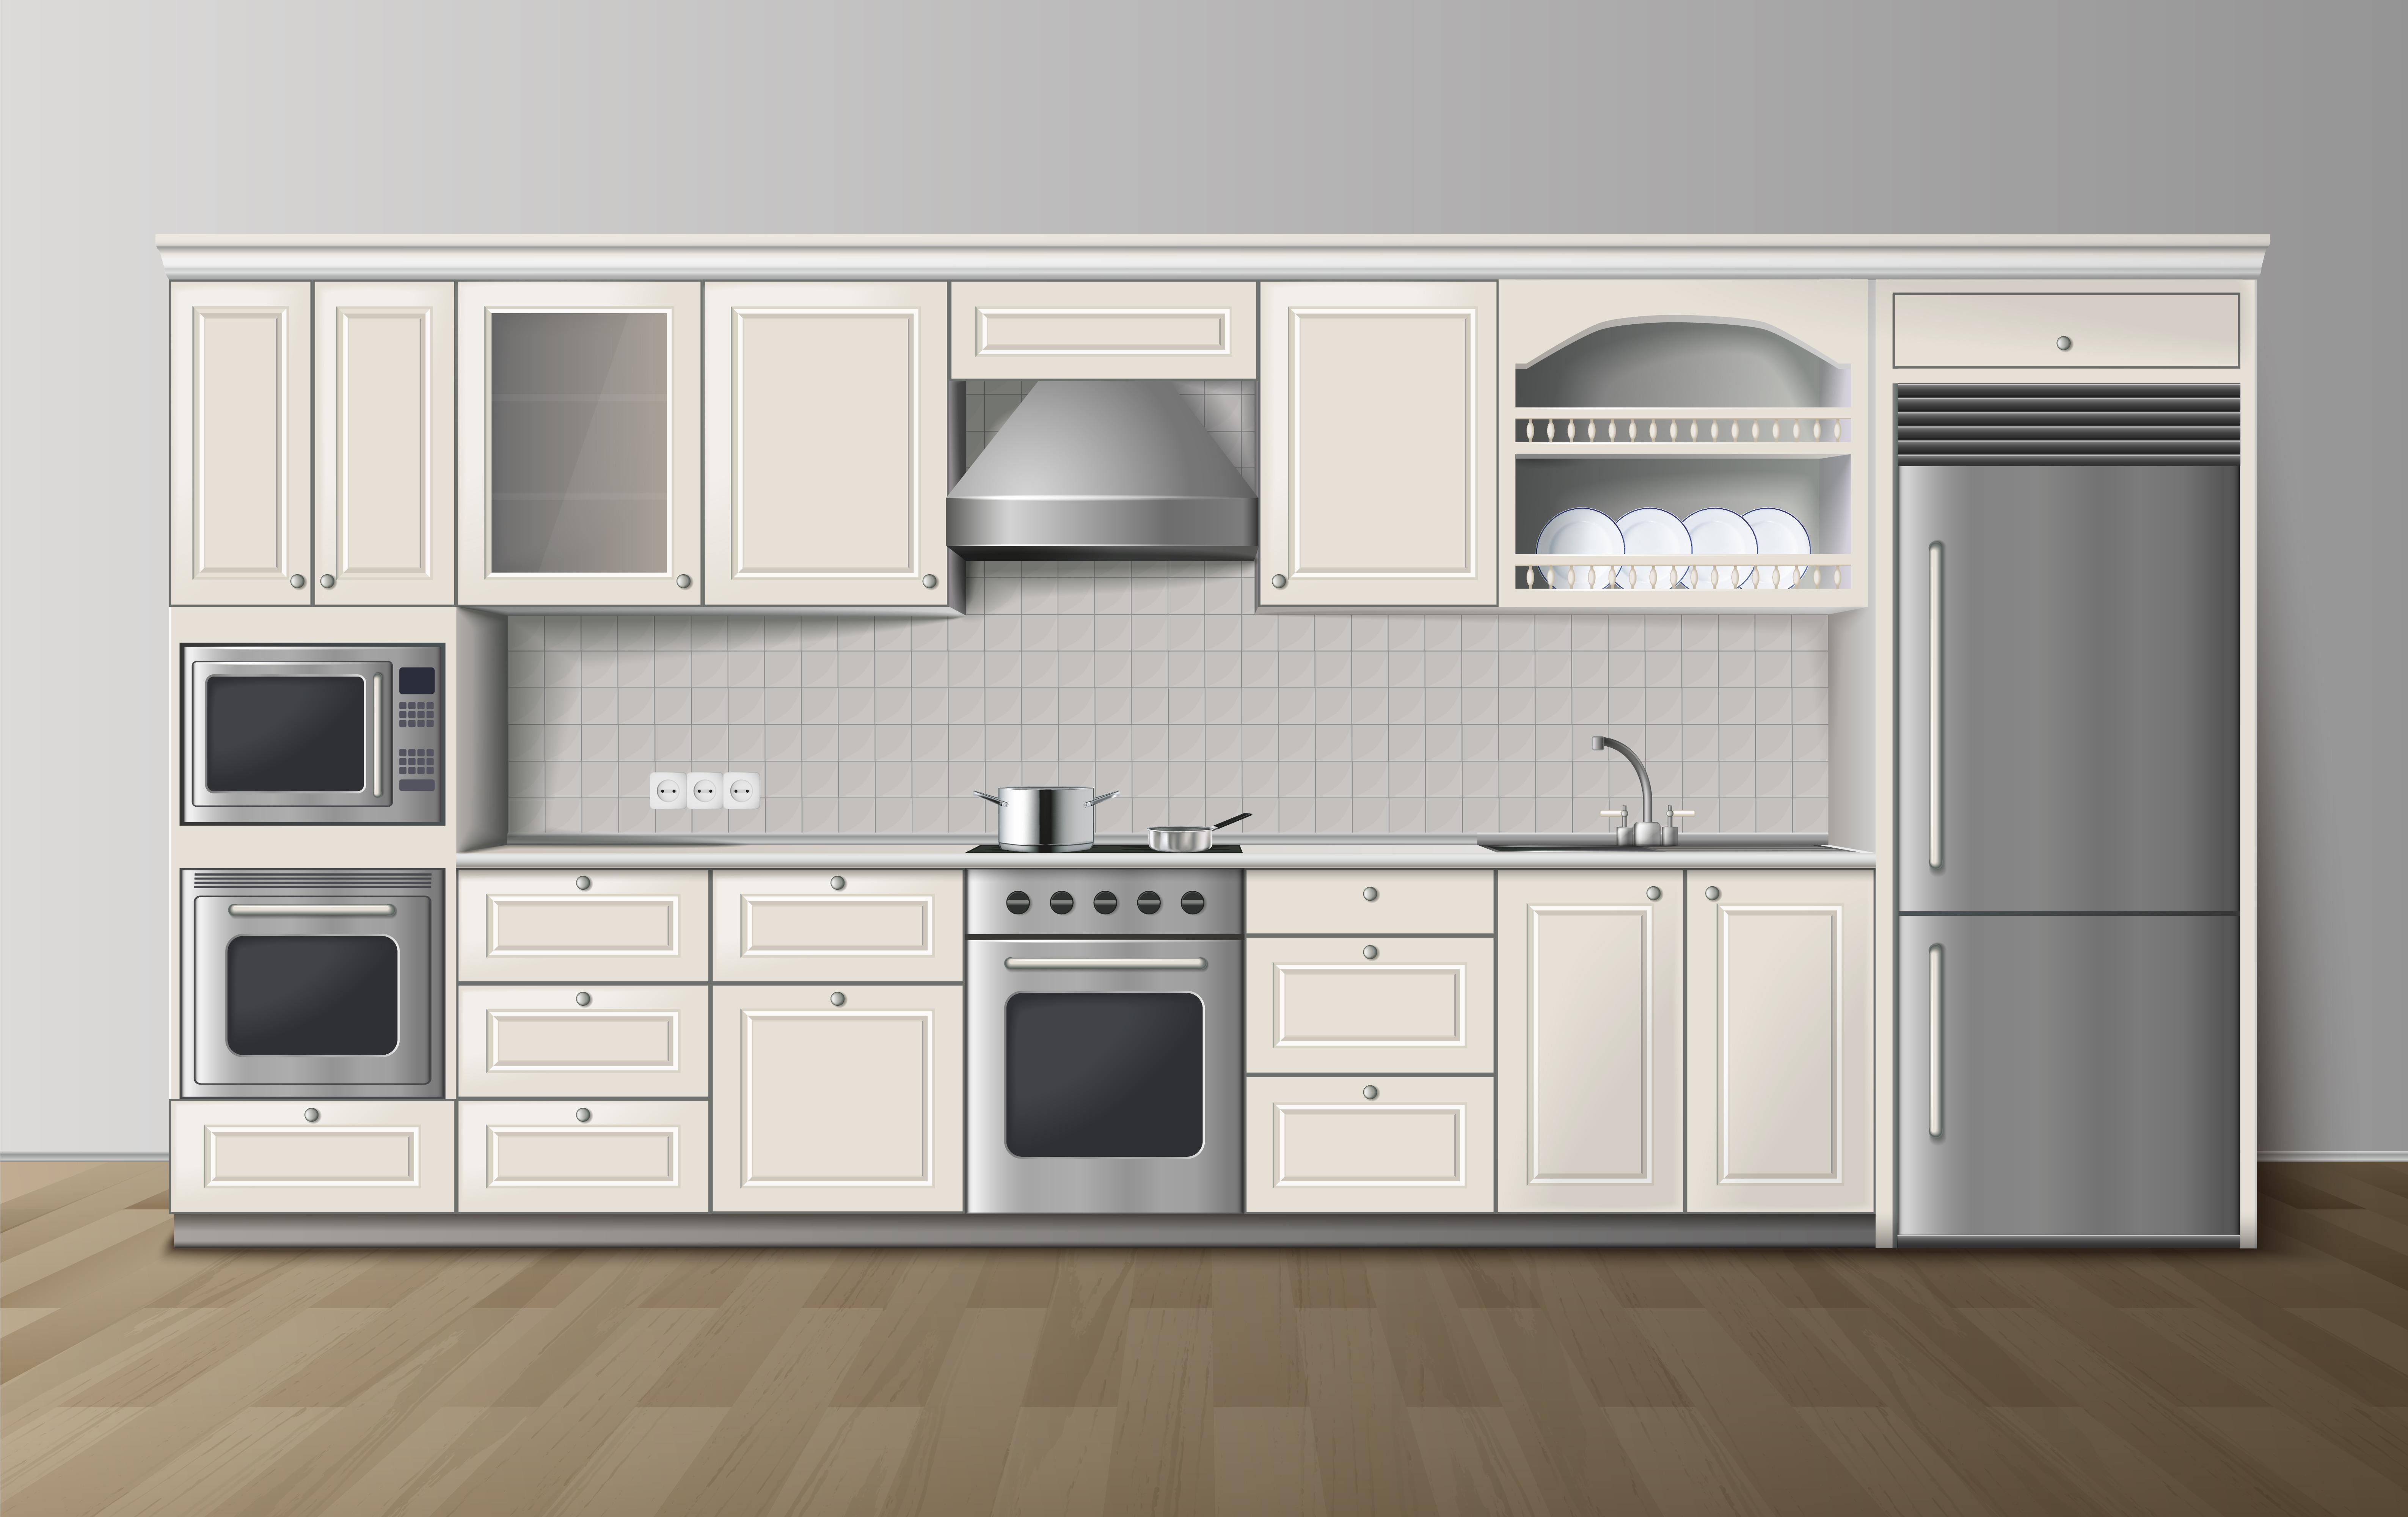 luxury kitchen white realistic interior image 471139